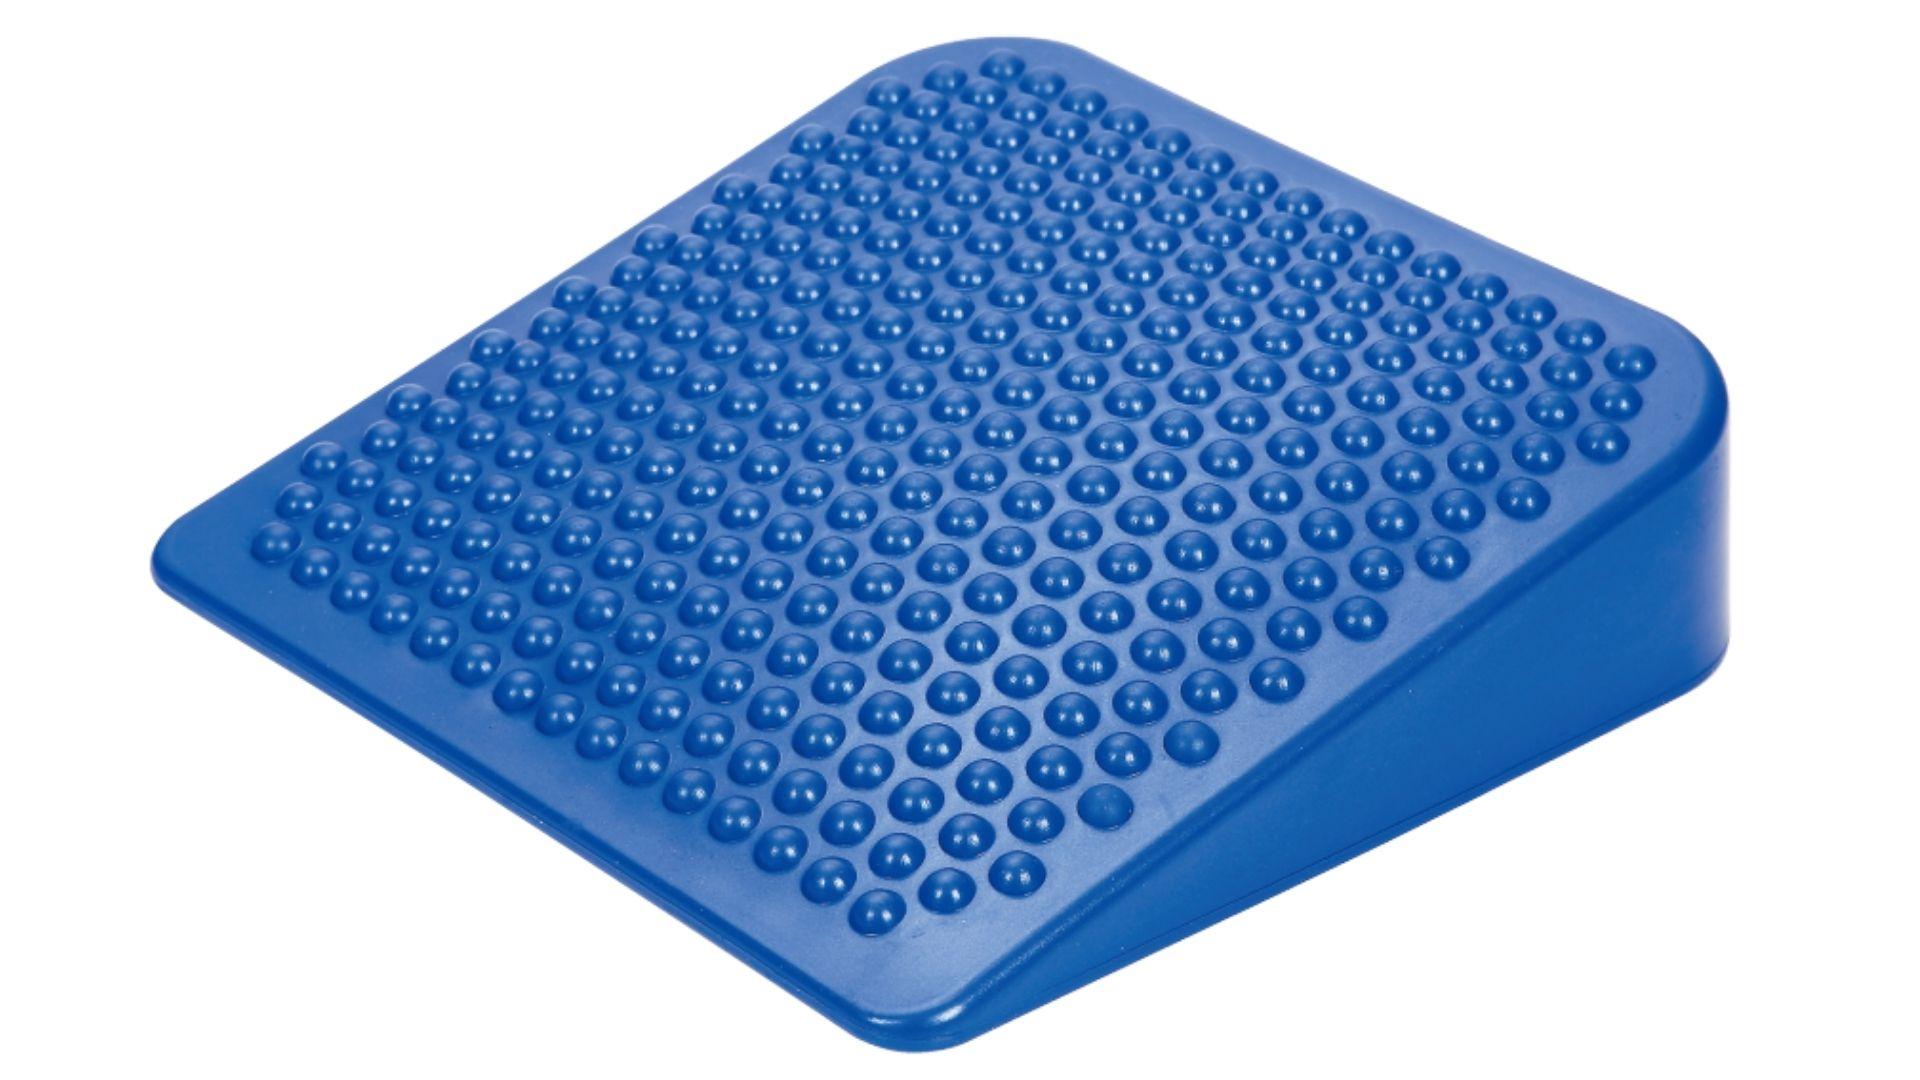 blue inflatable wobble cushion wedge